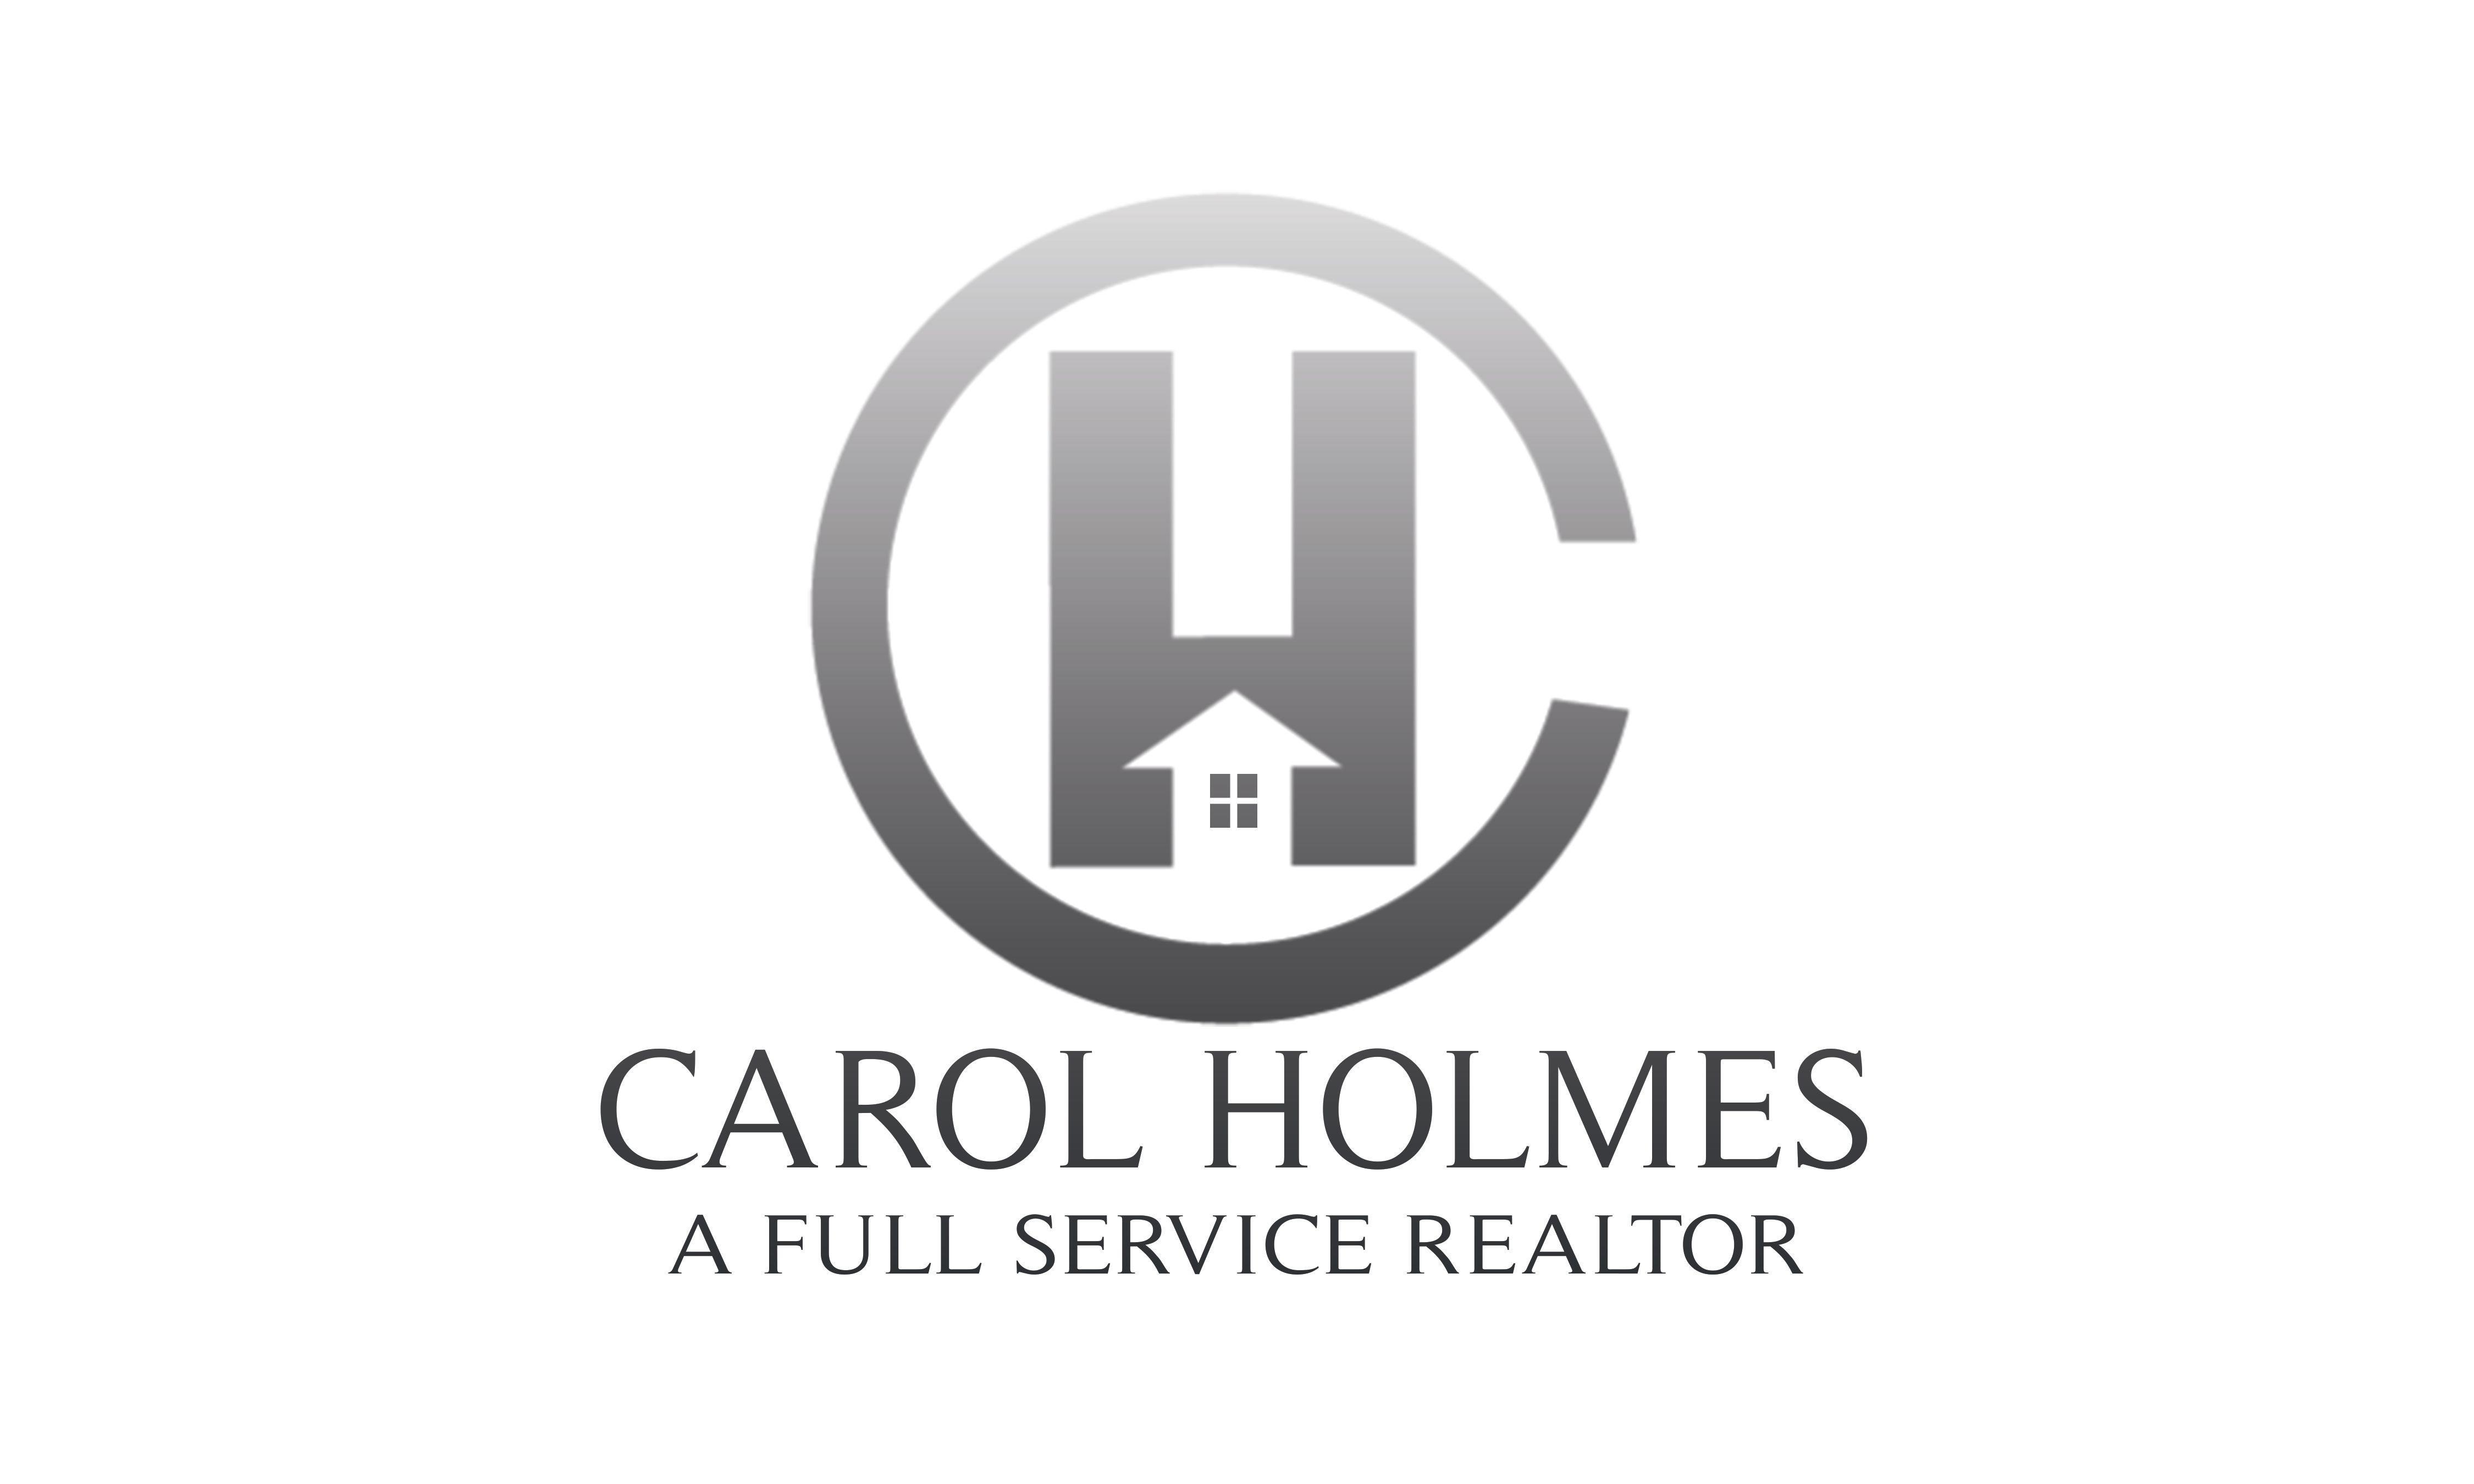 Carol Holmes, Realtor